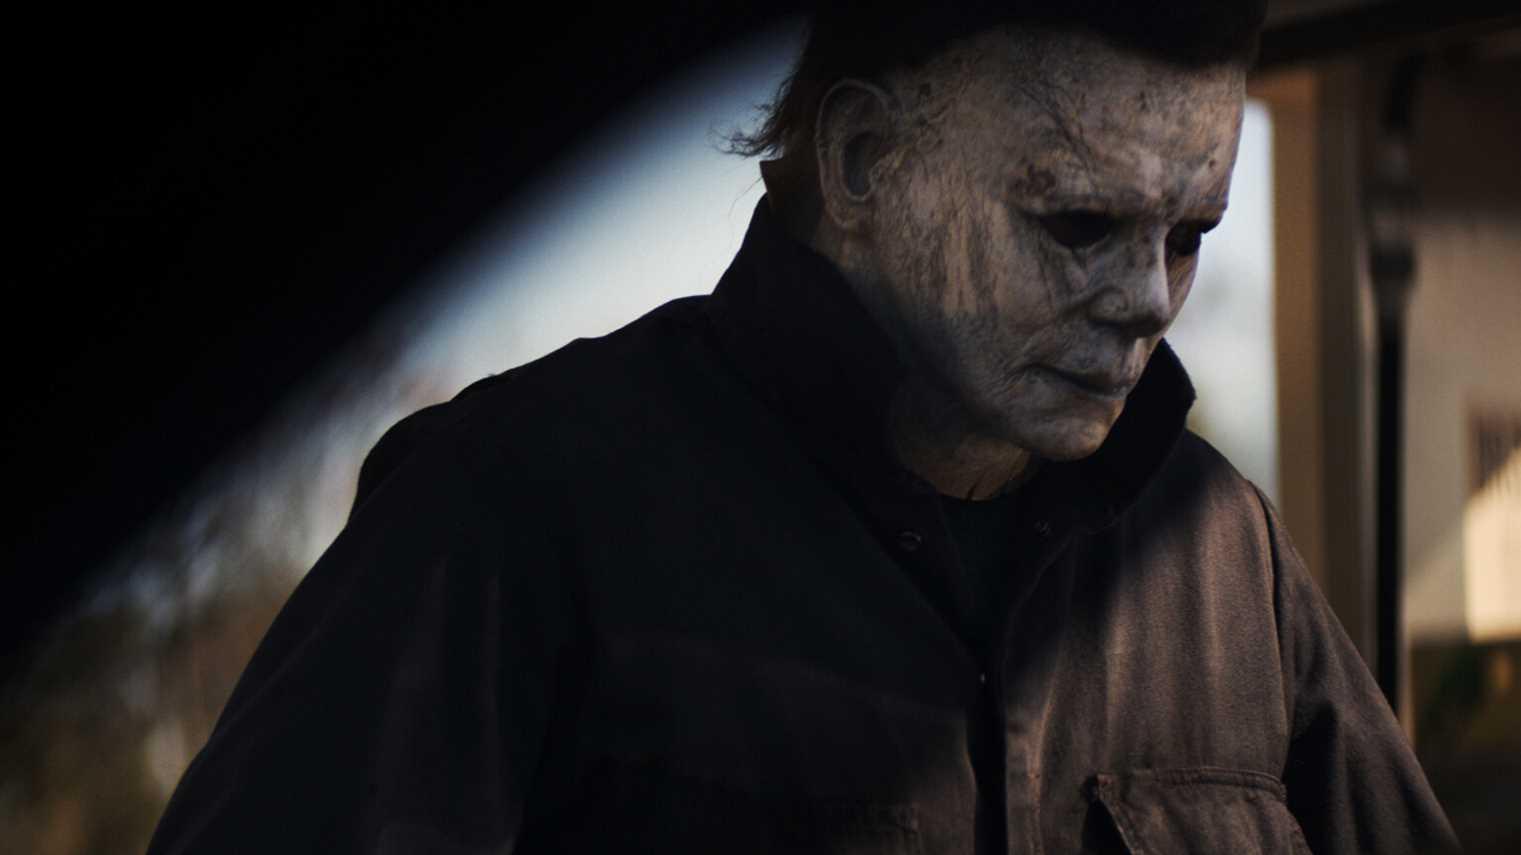 the nine scariest horror films for a halloween movie marathon